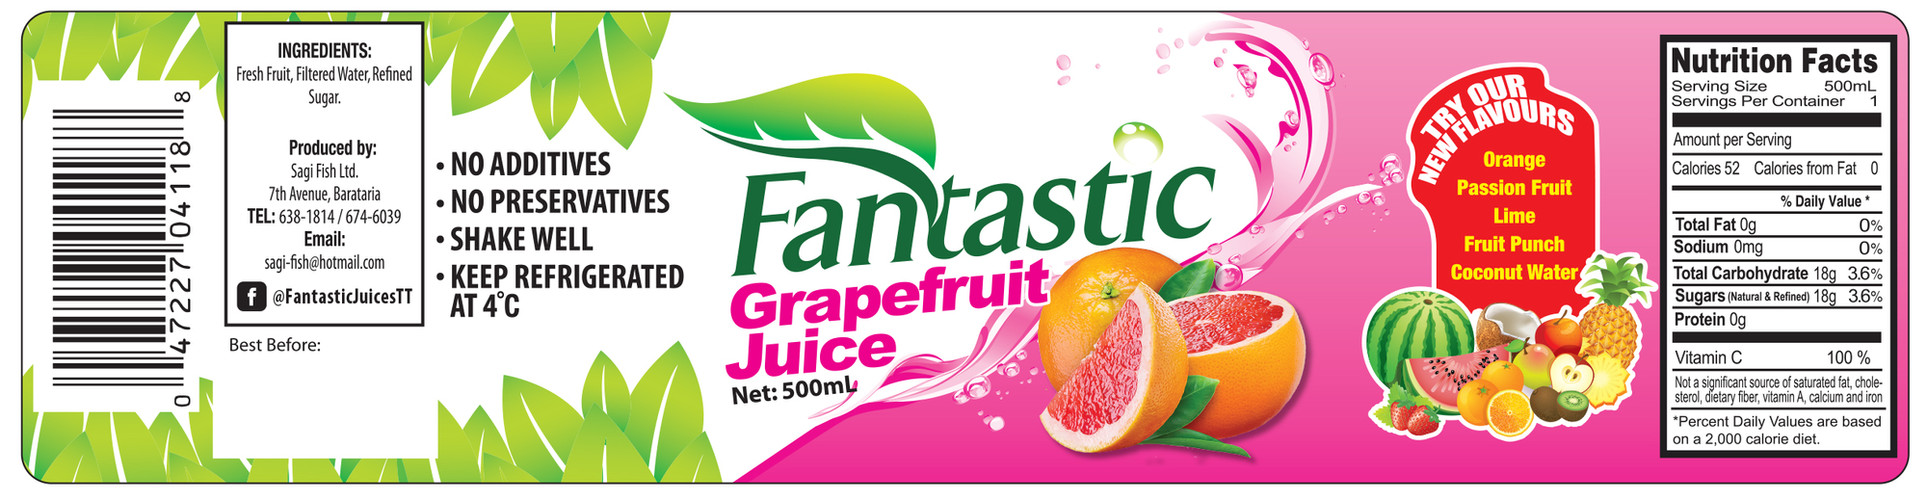 Fantastic Grapefruit Juice (Layout).jpg